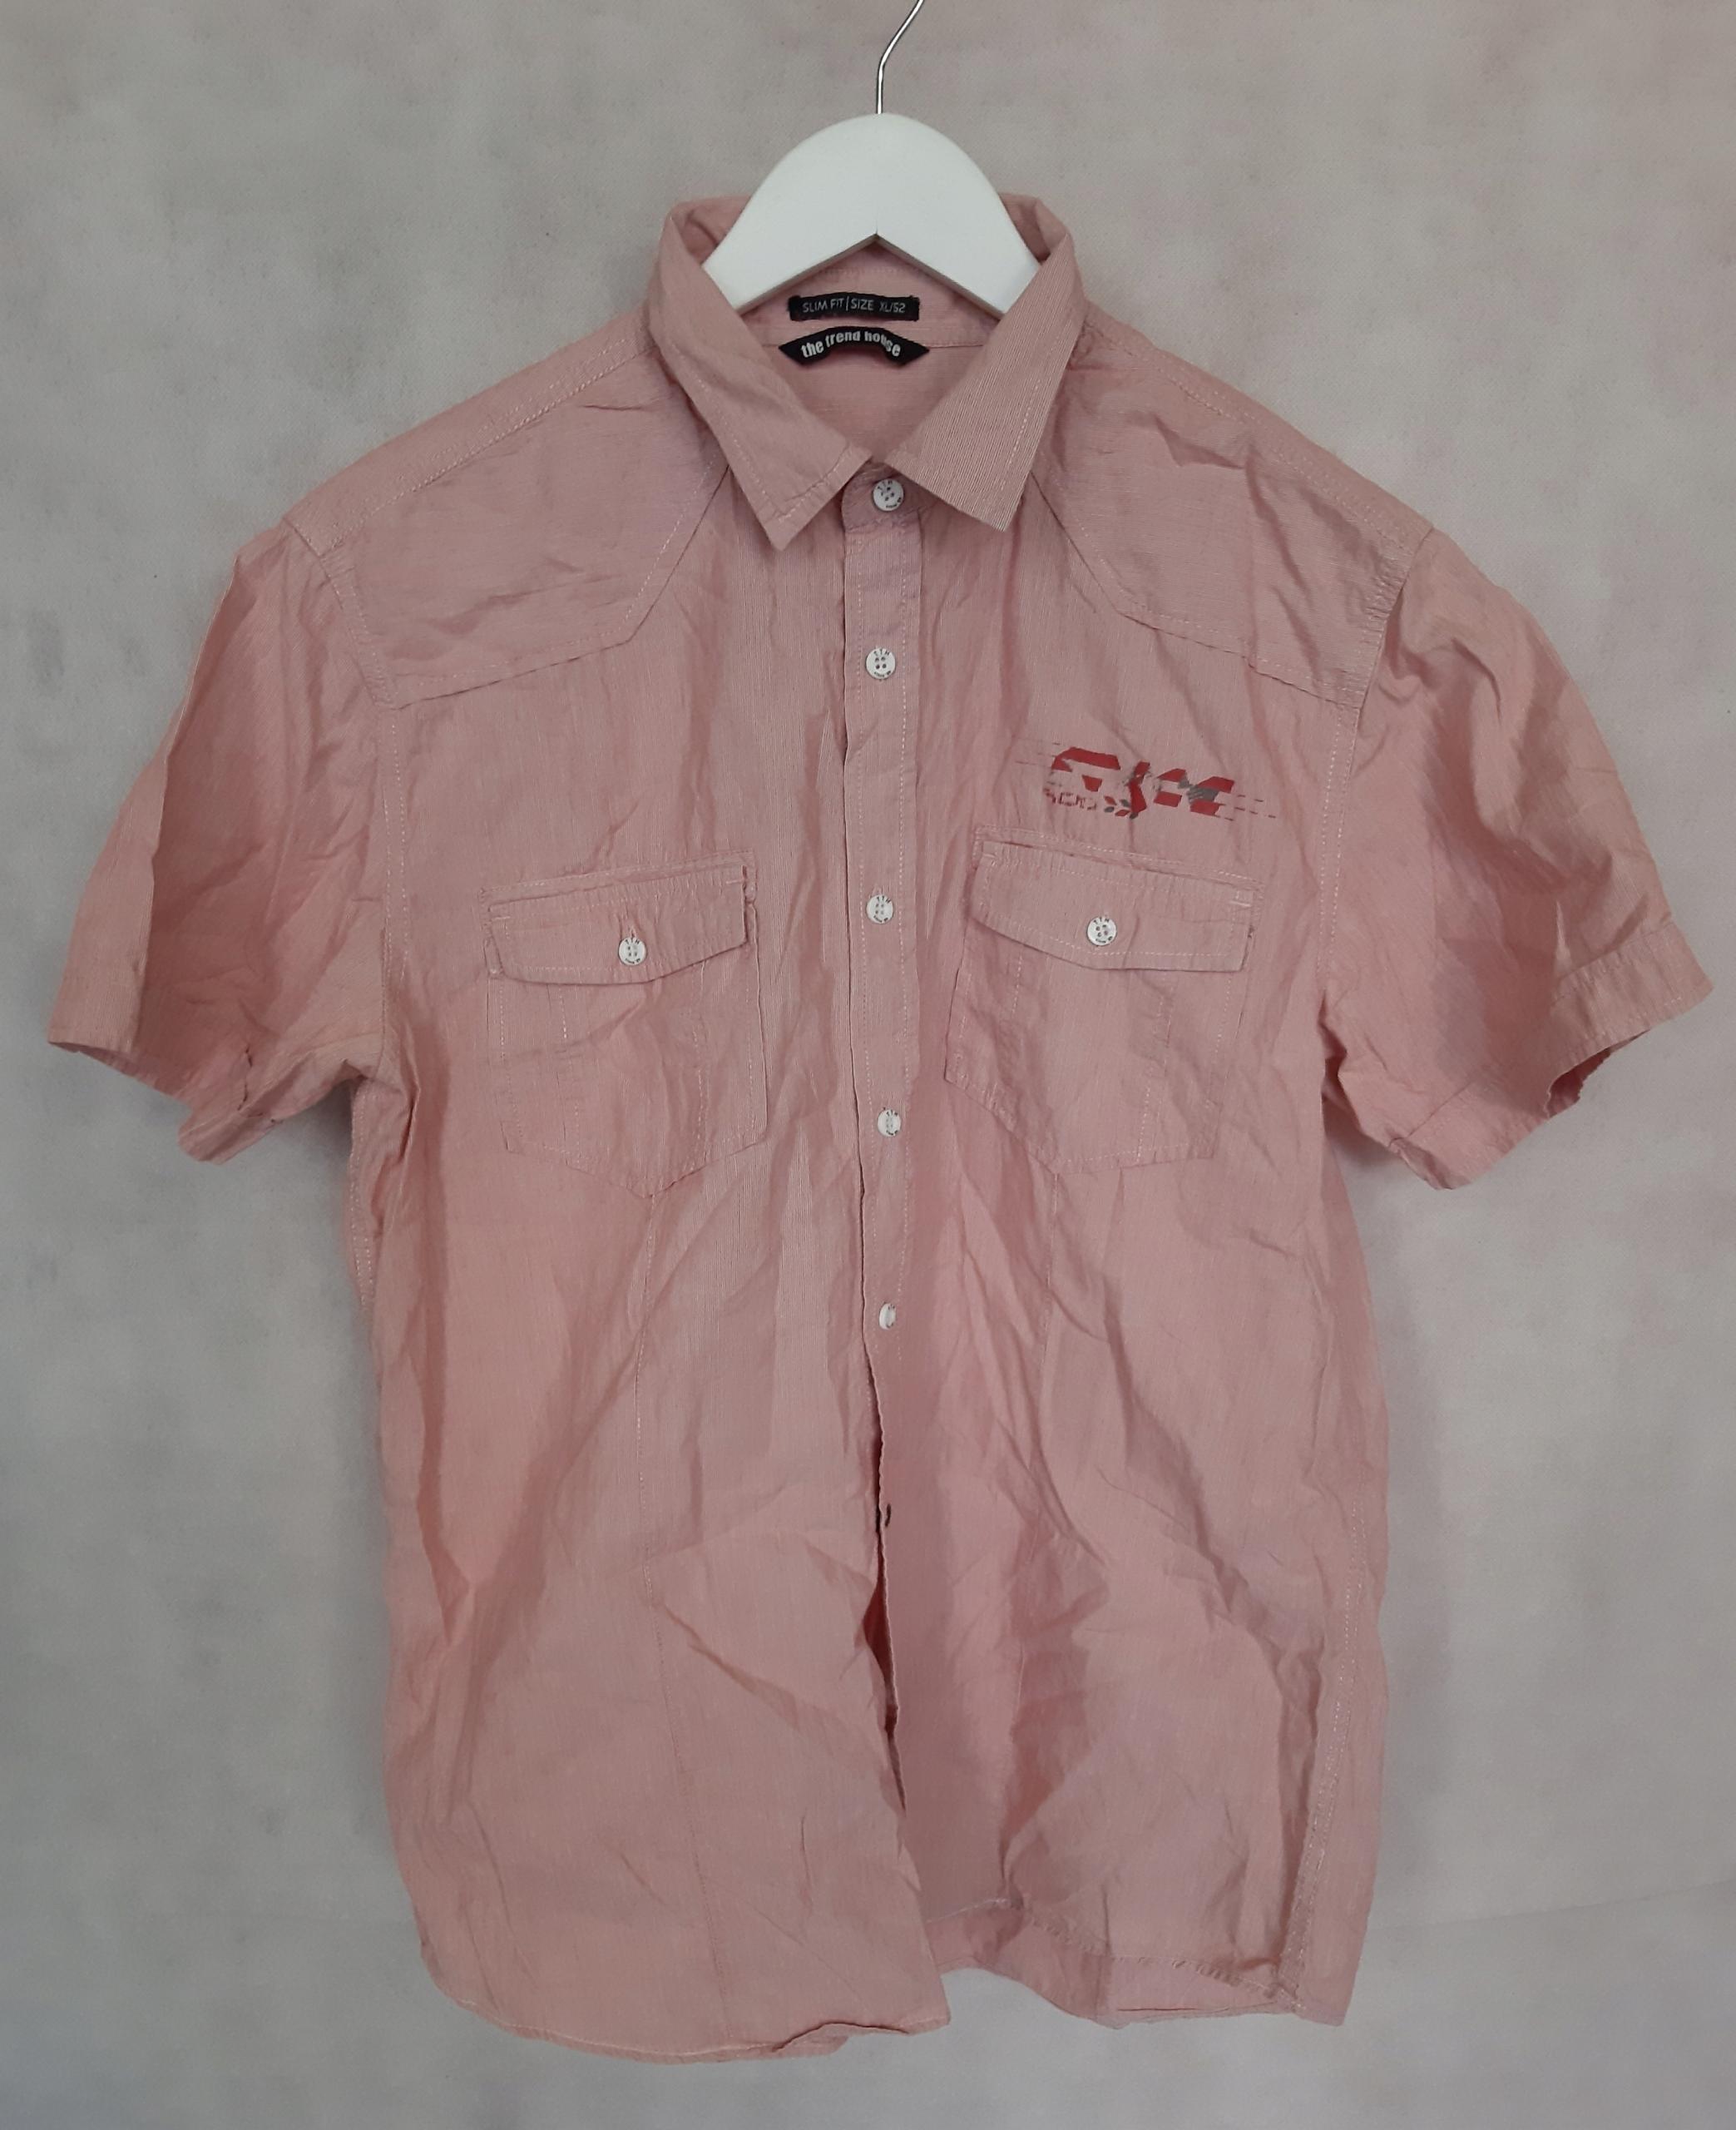 Koszula męska w paski the trend house r. XL R3